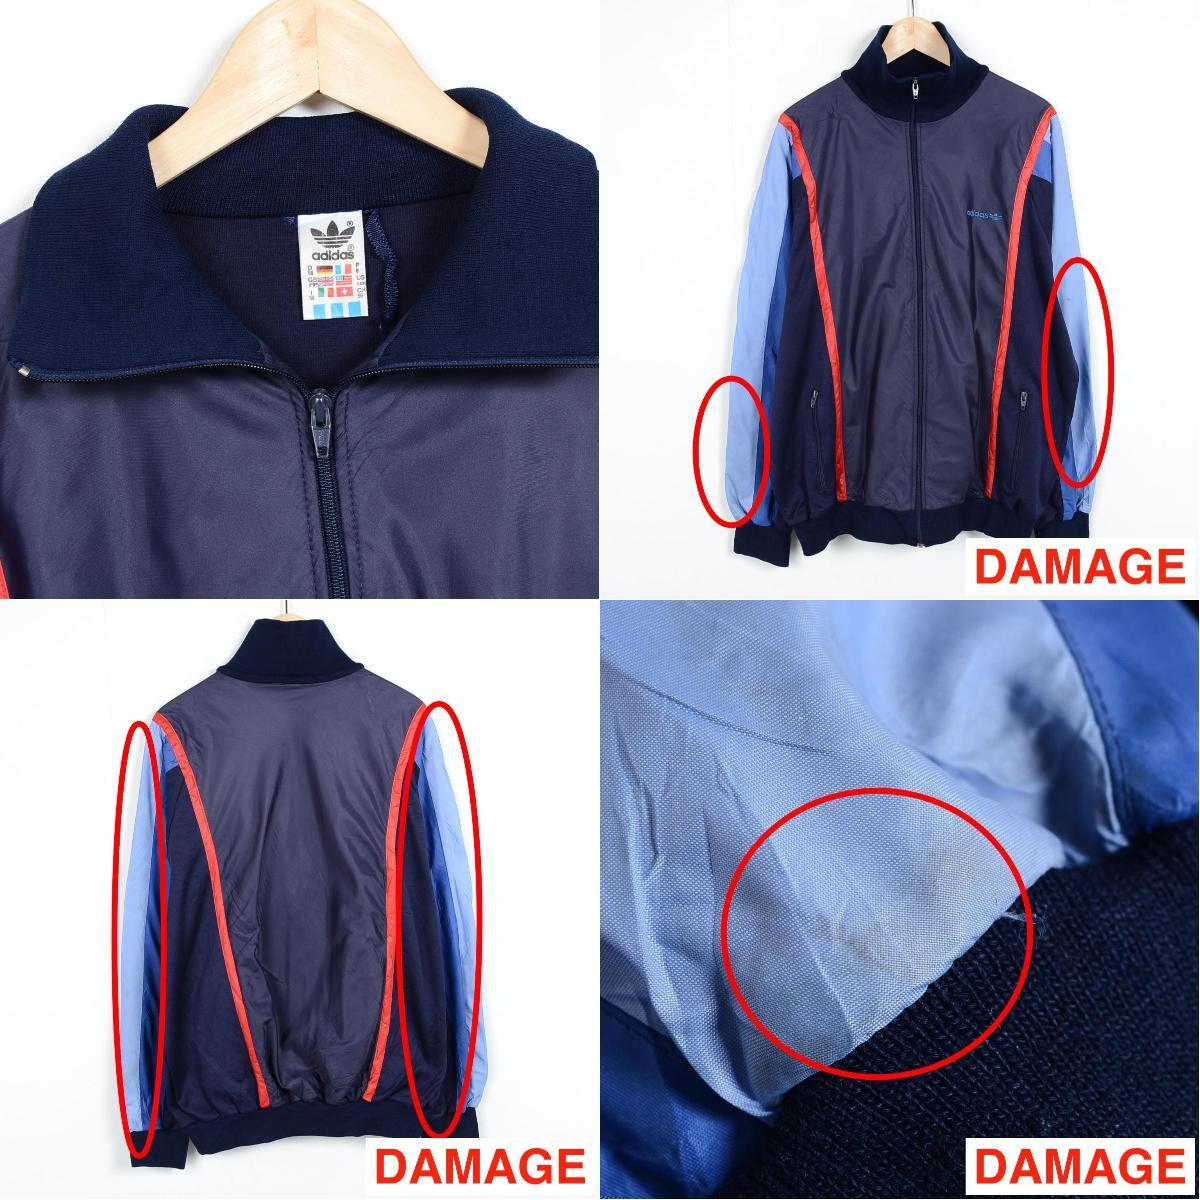 7f8bad82c9a adidas sports jacket - Membrane Switch Technologies